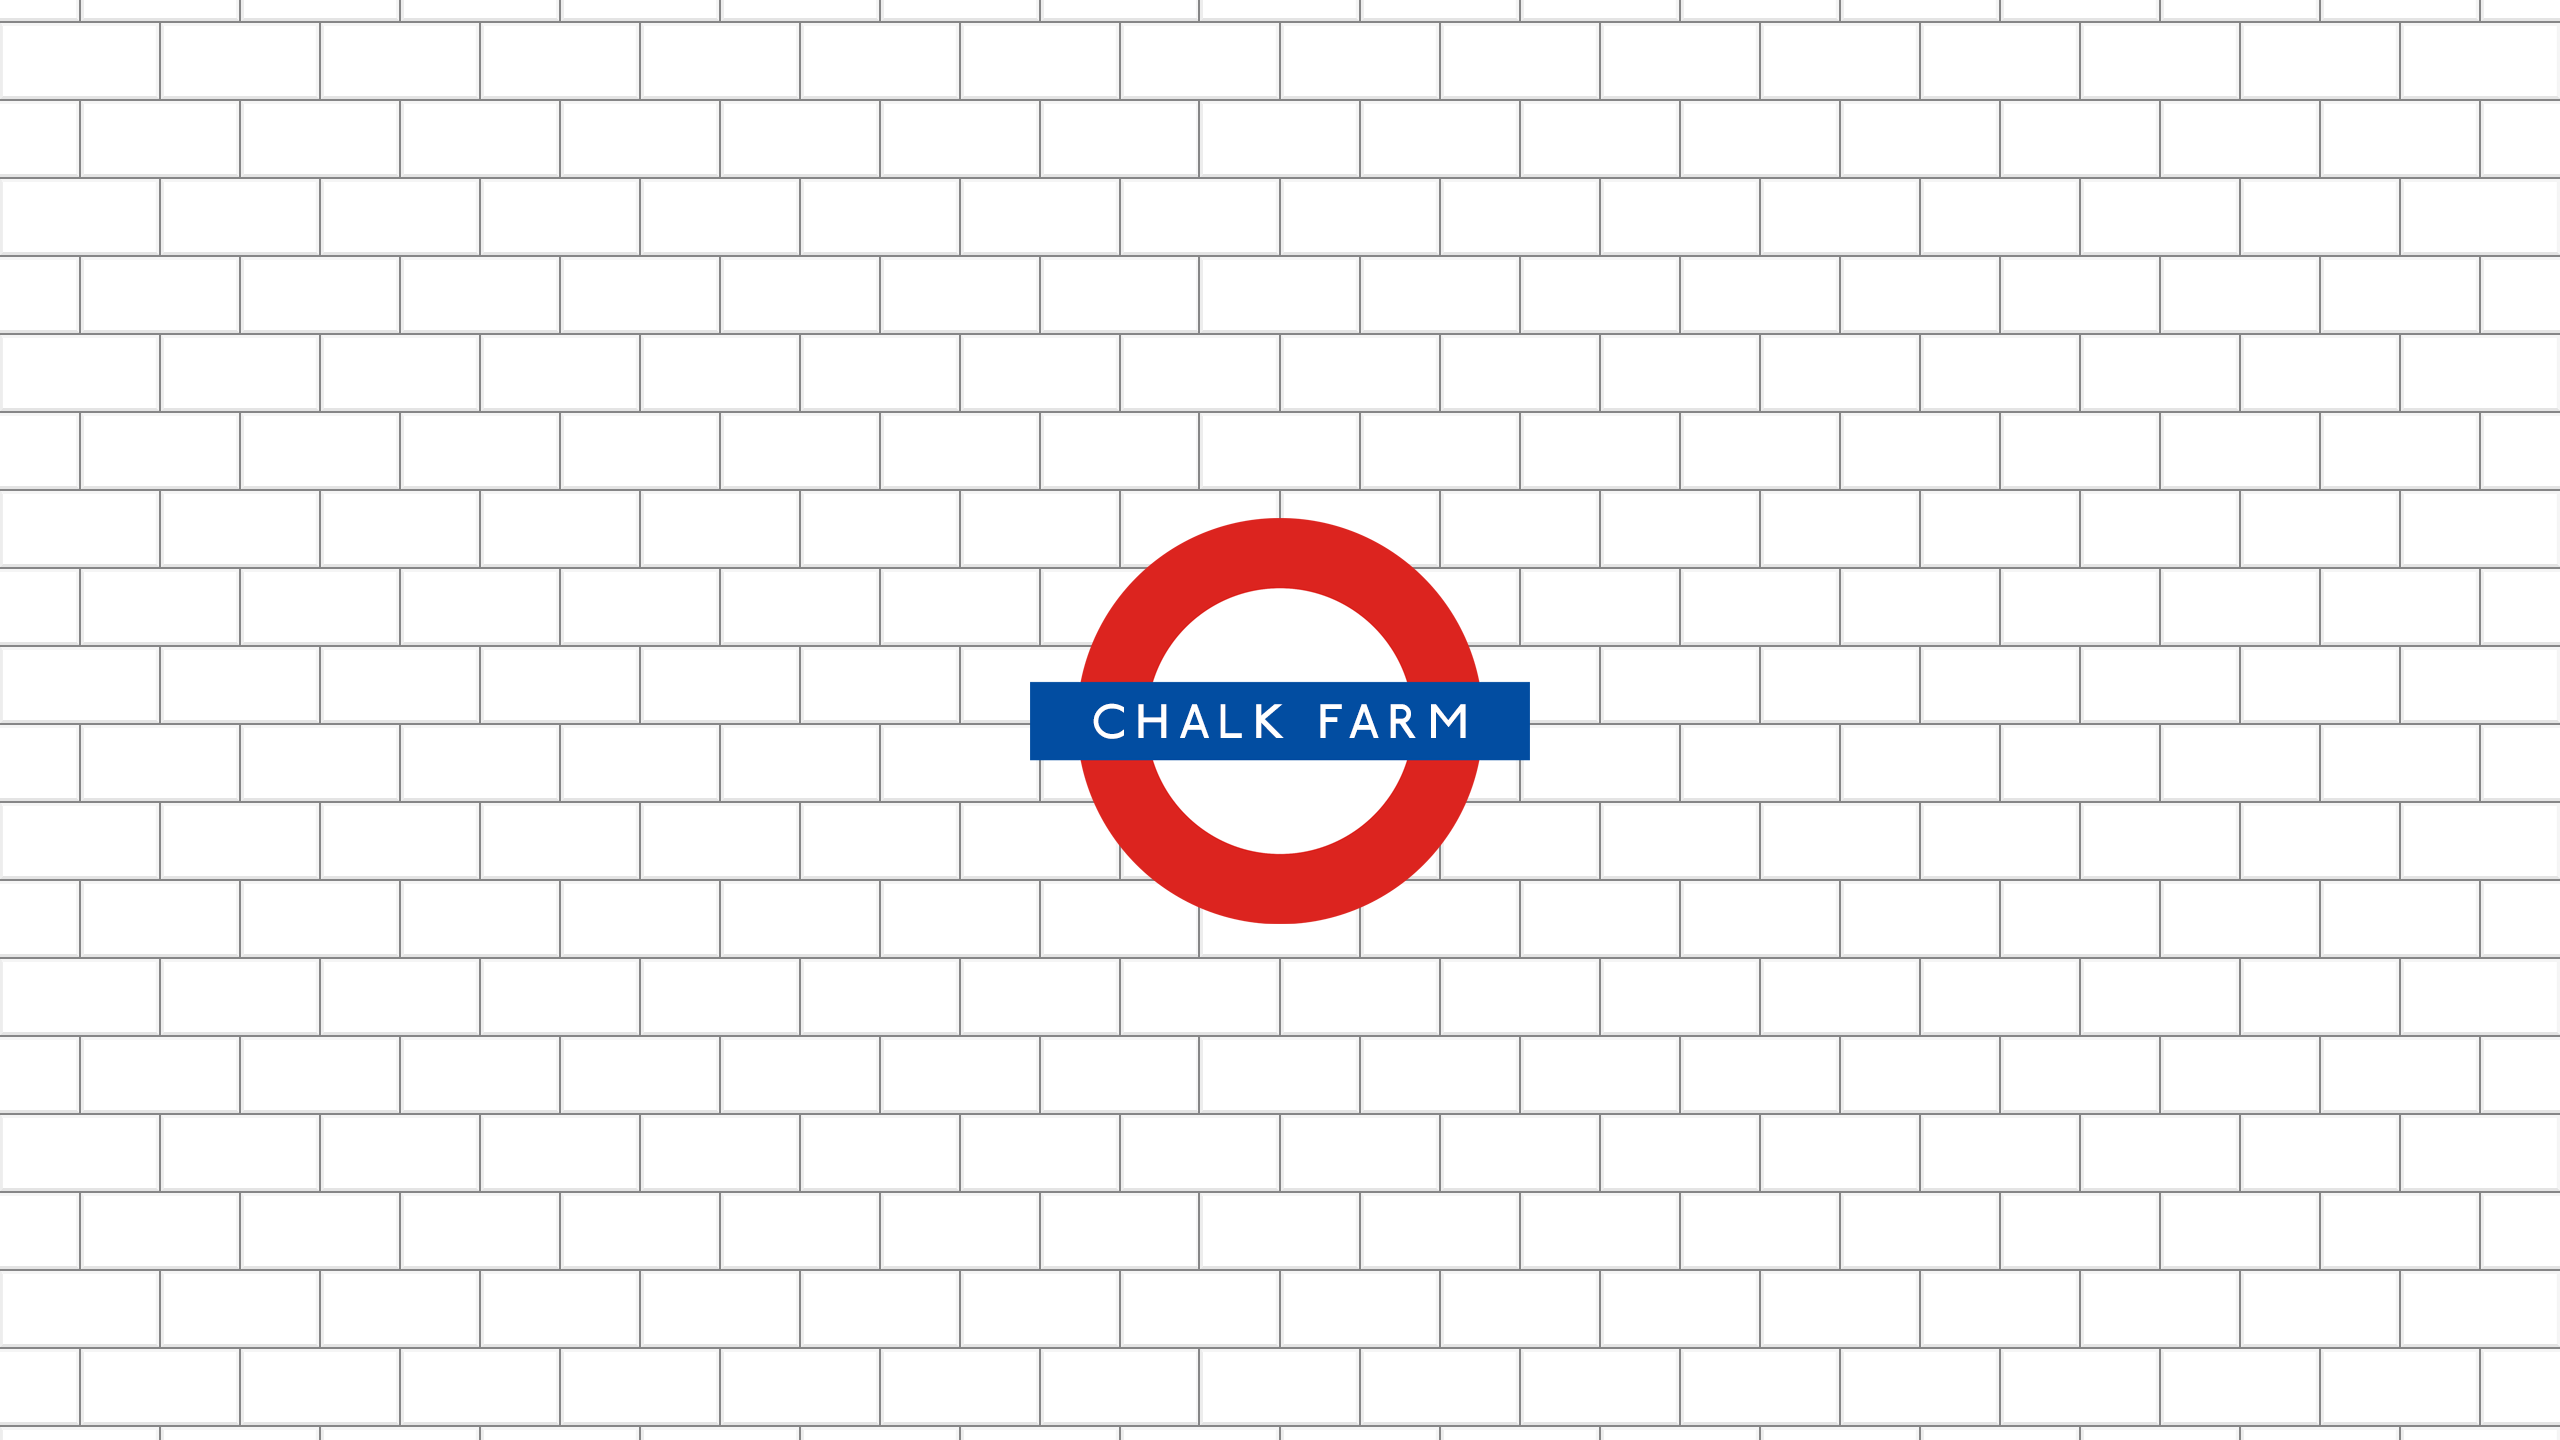 Chalk Farm